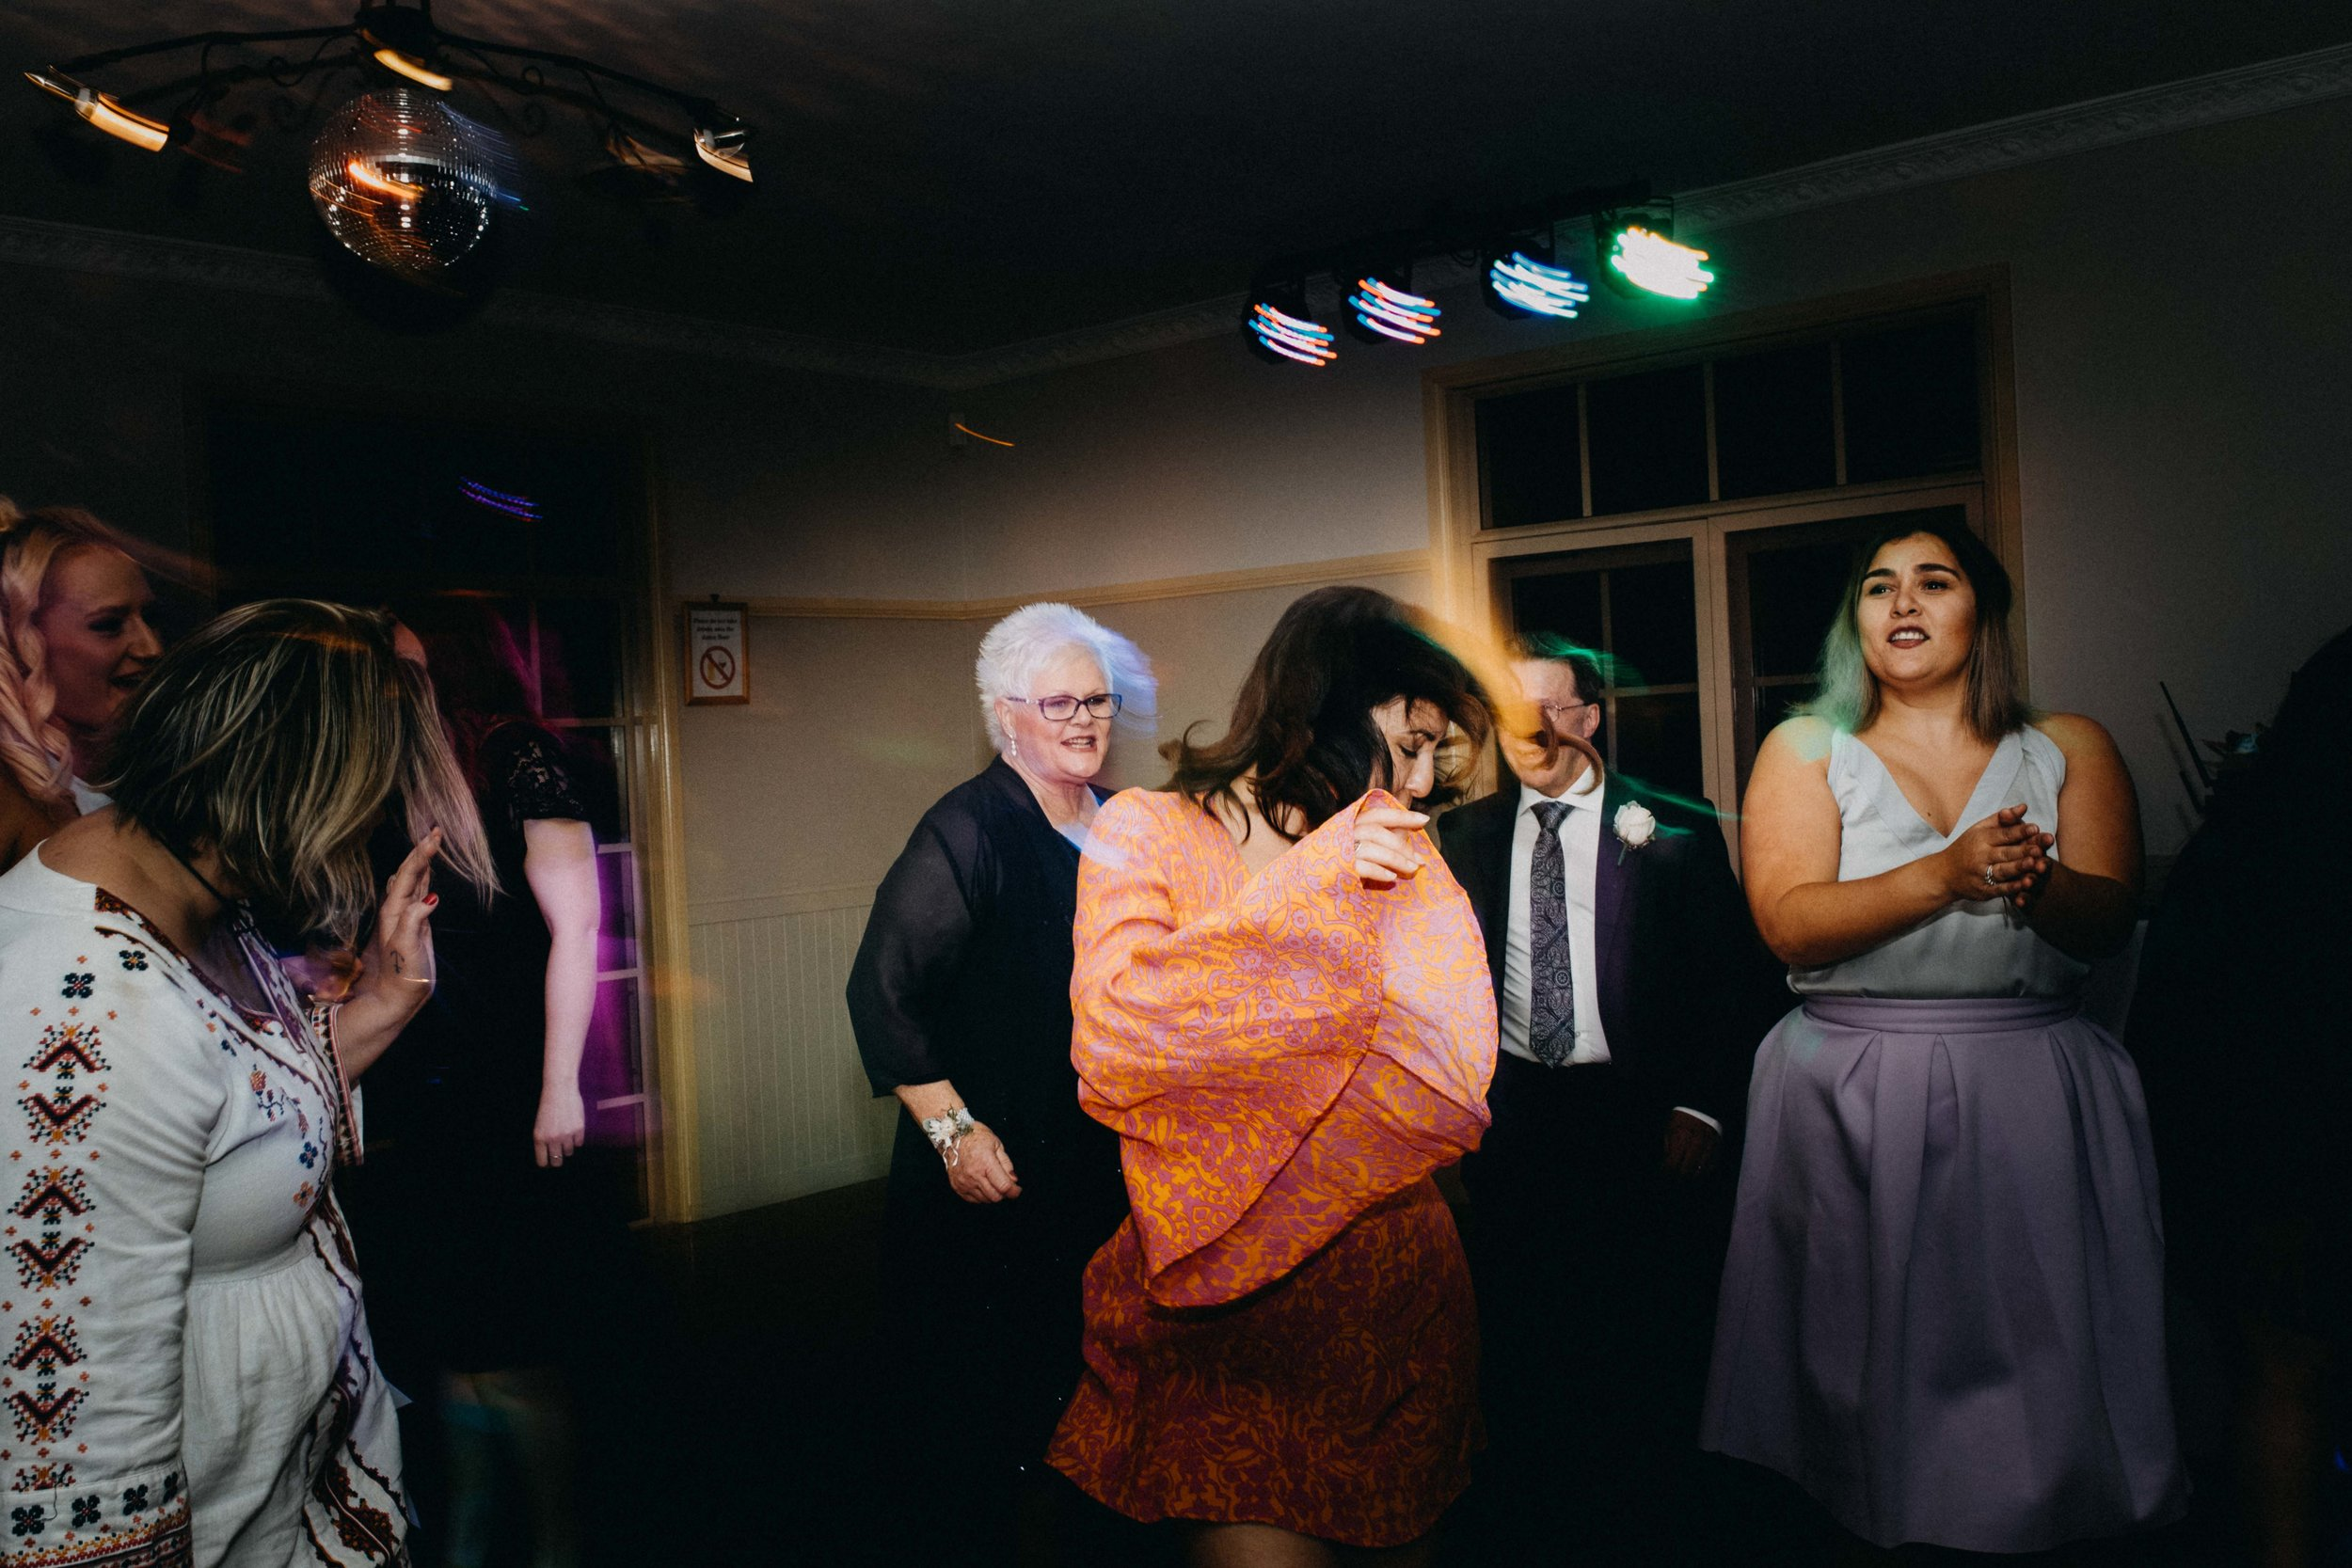 appin-house-wedding-macarthur-www.emilyobrienphotography.net-187.jpg